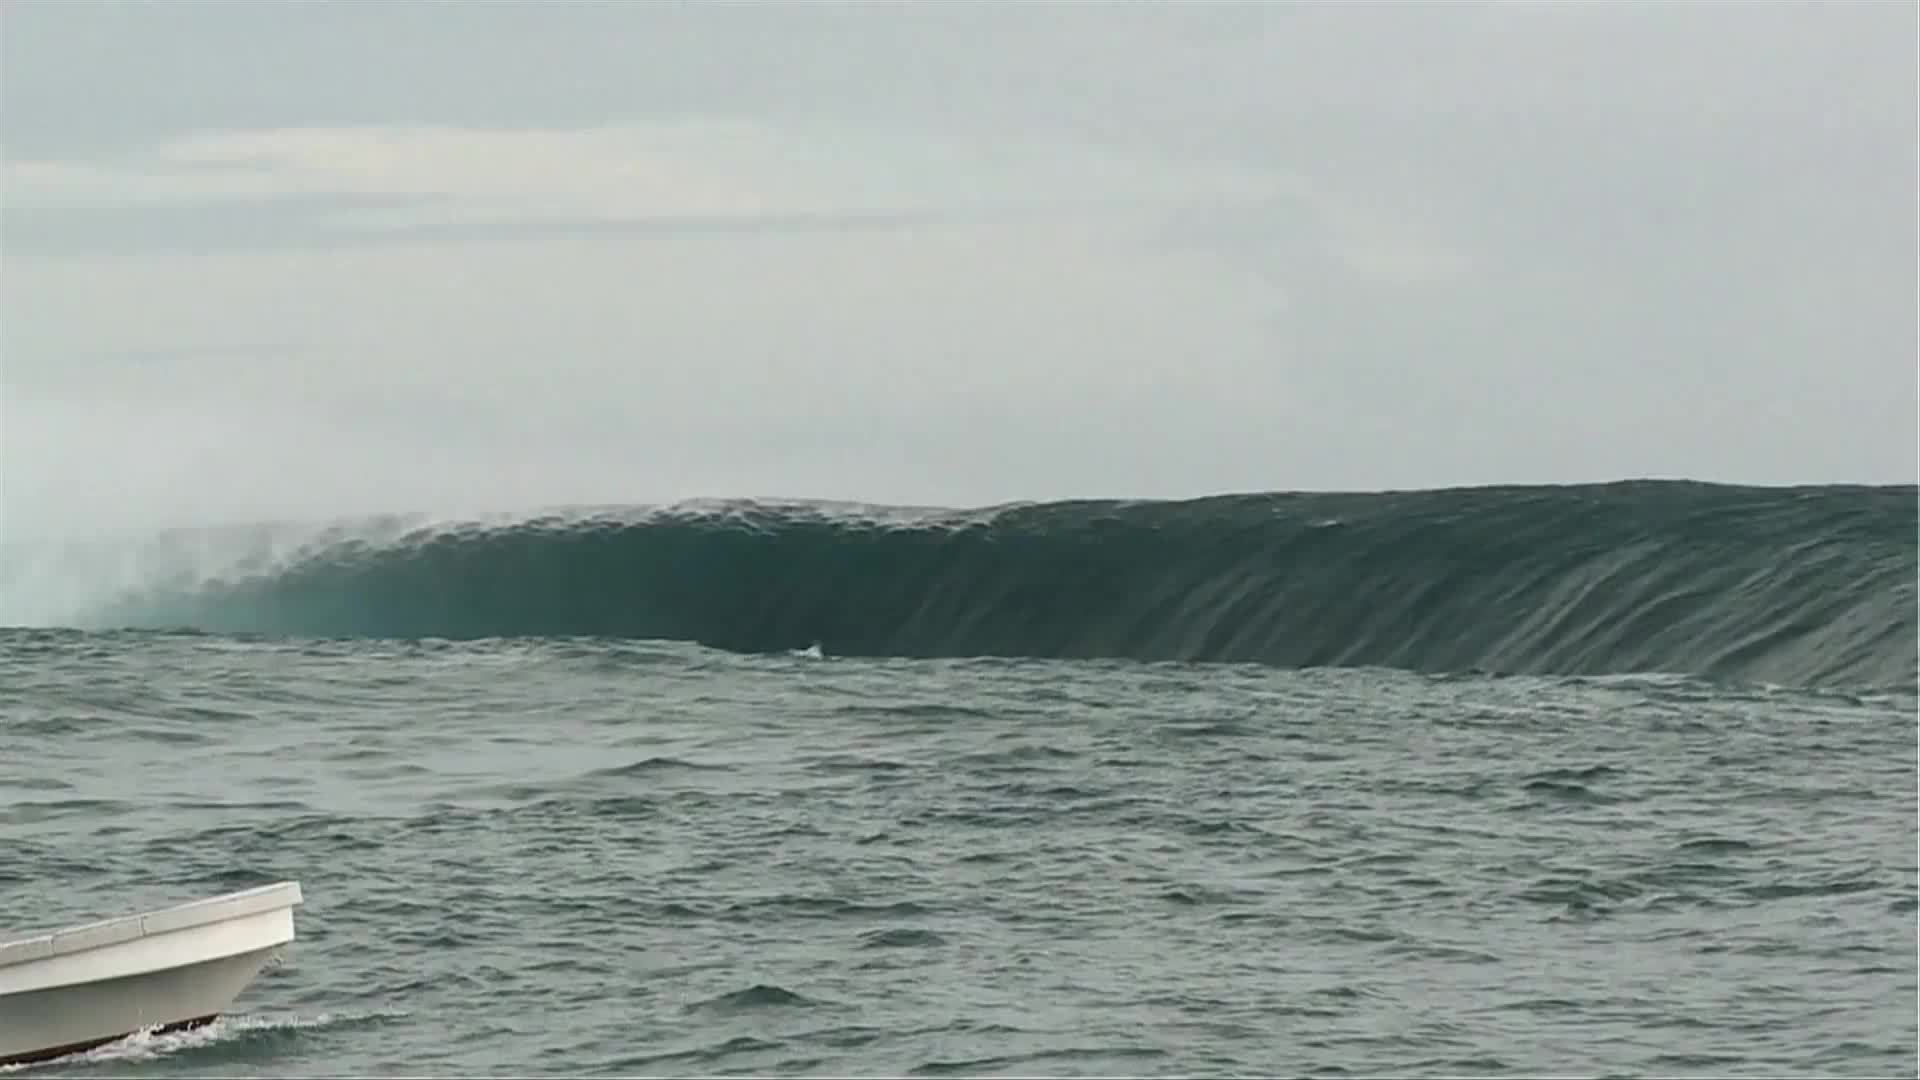 AnimalsBeingJerks, HeavySeas, gifsthatendtoosoon, once in a lifetime wave at Fiji's Cloudbreak. 2012 GIFs